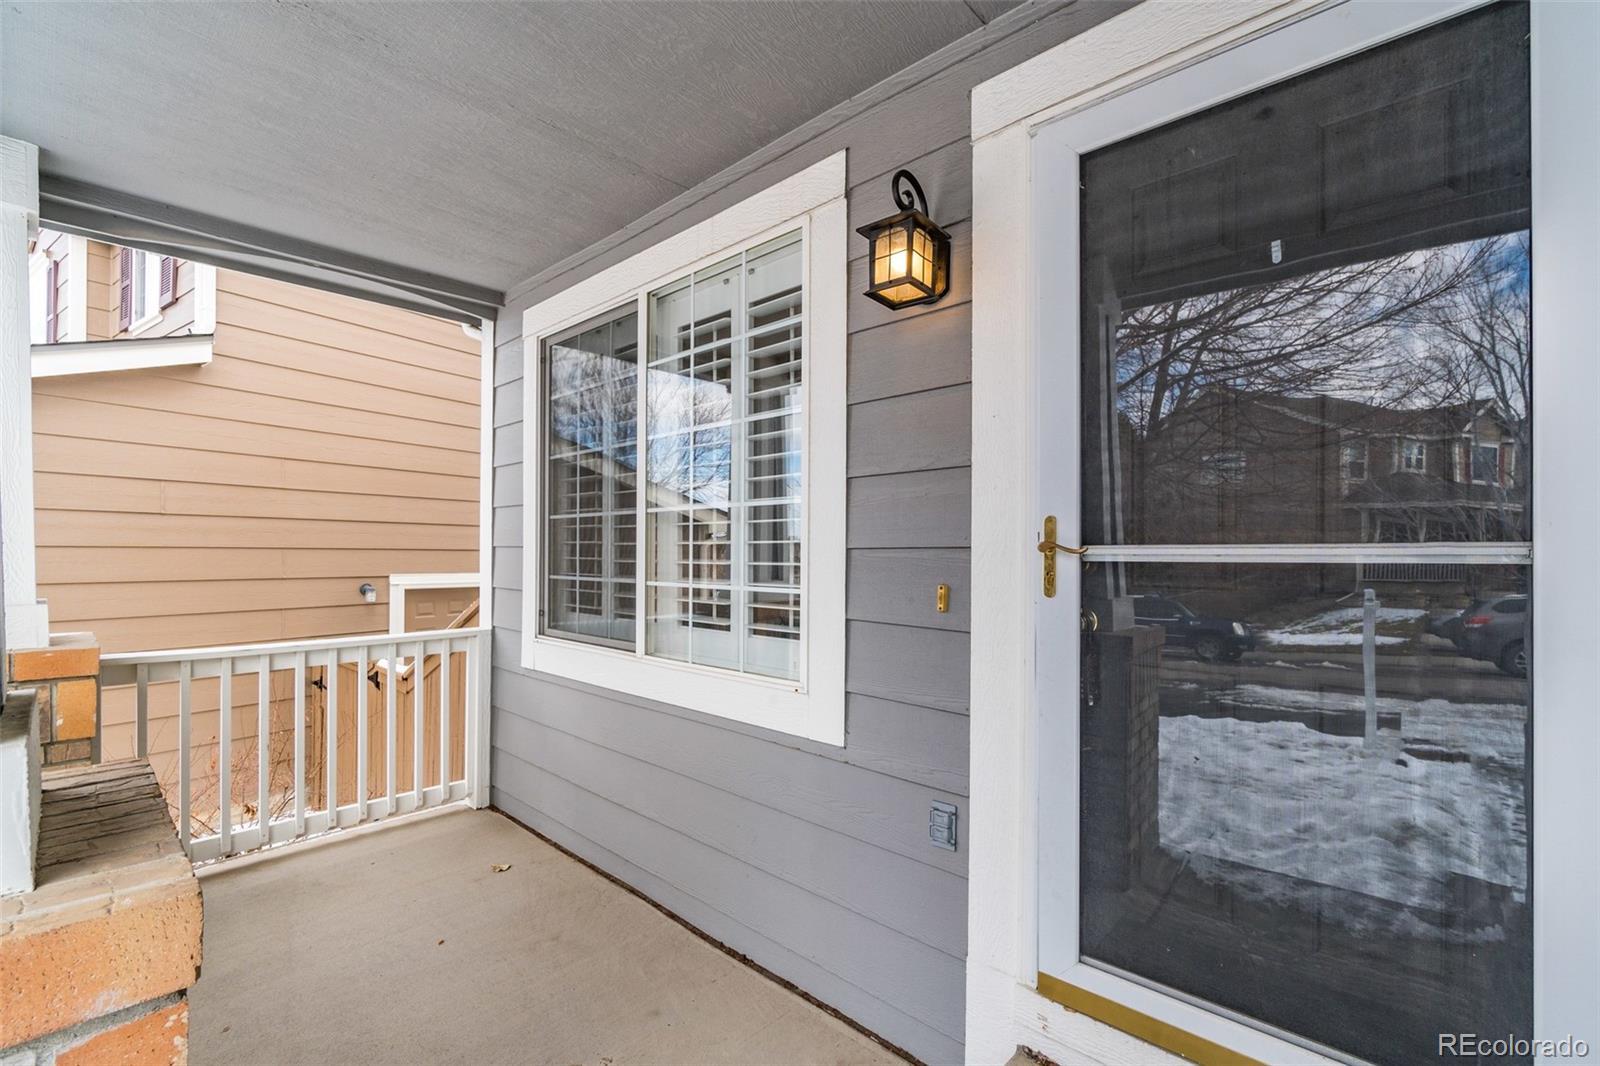 MLS# 3814052 - 2 - 10500 Ketchwood Court, Highlands Ranch, CO 80130